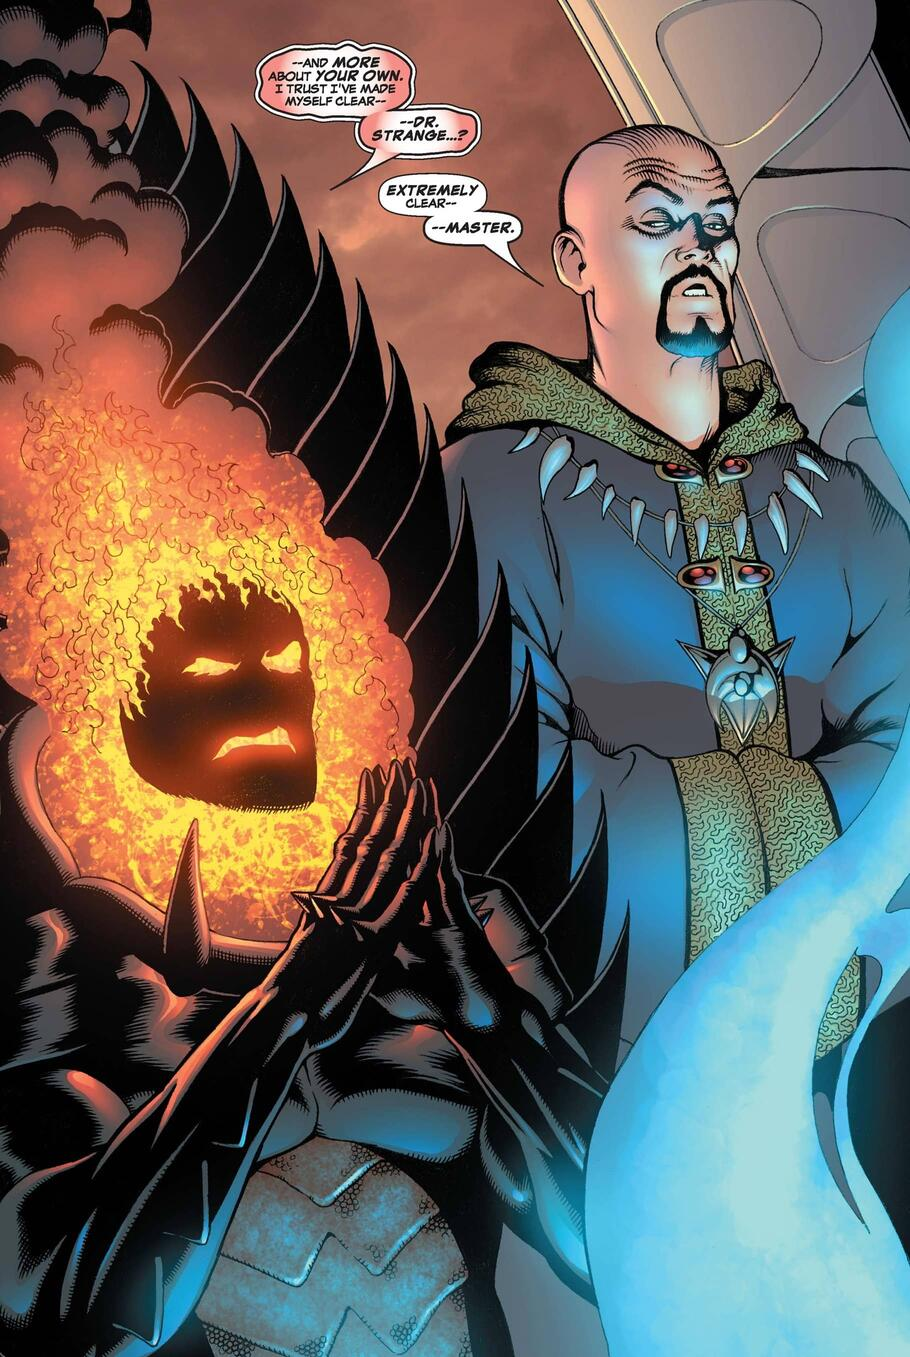 Evil Doctor Strange by Dormammu's side in DEFENDERS (2005) #3.